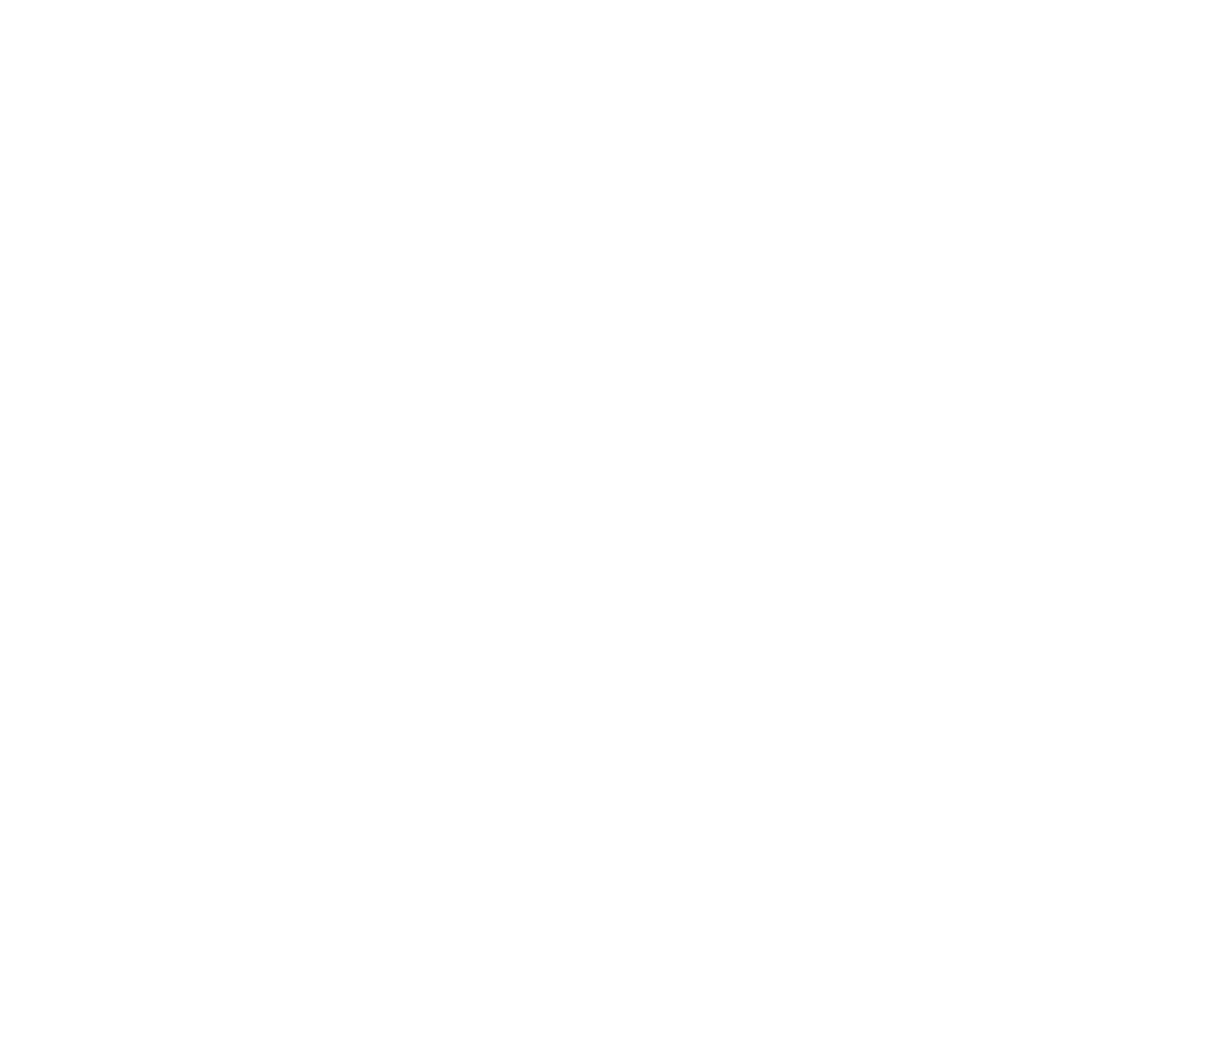 Ahsra Arizona High School Rodeo Association